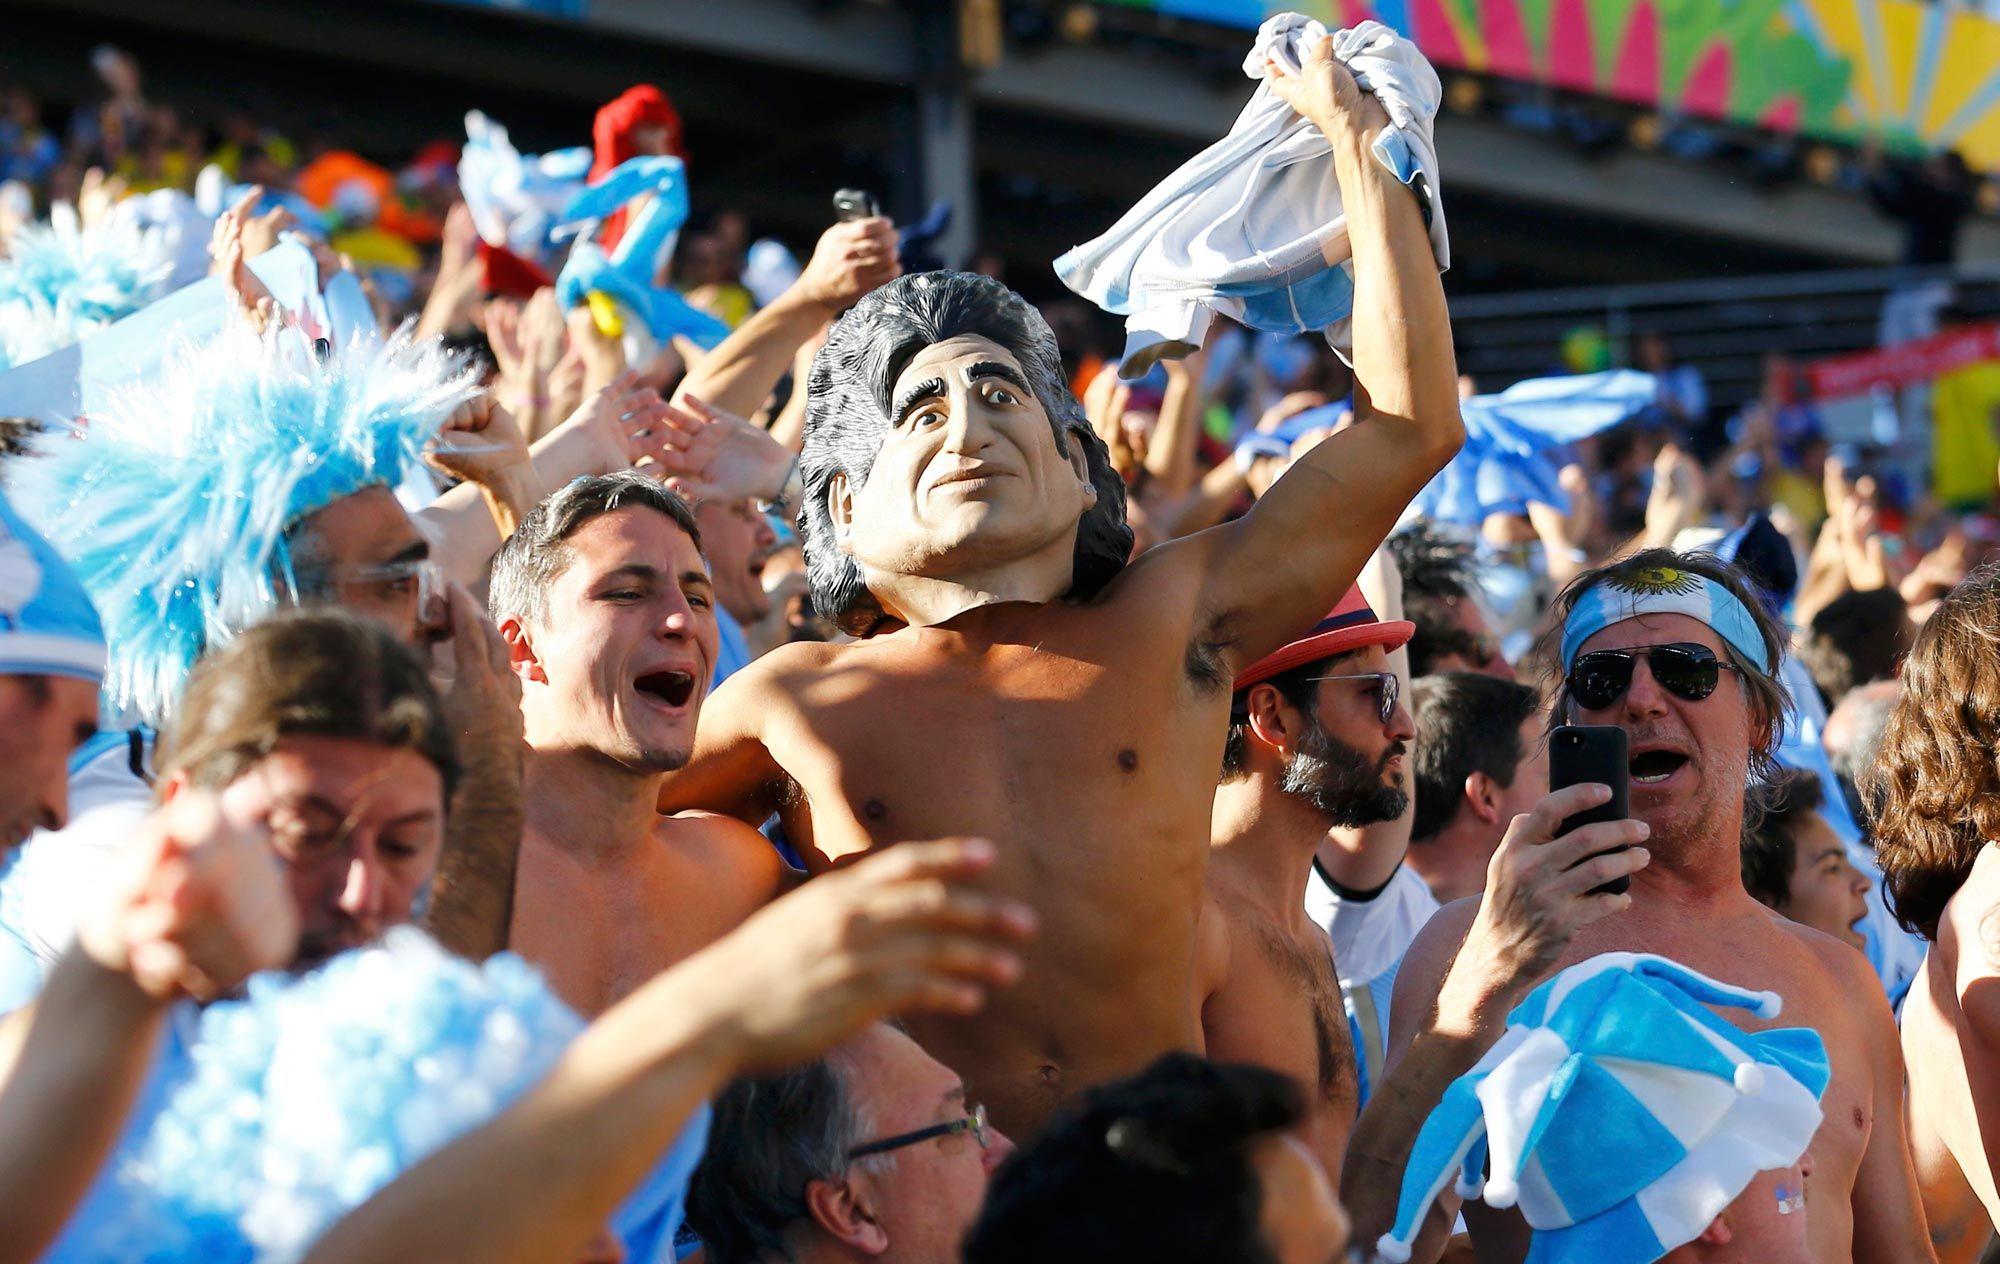 Torcida argentina para matéria sobre rivalidade na Copa #dECObertura